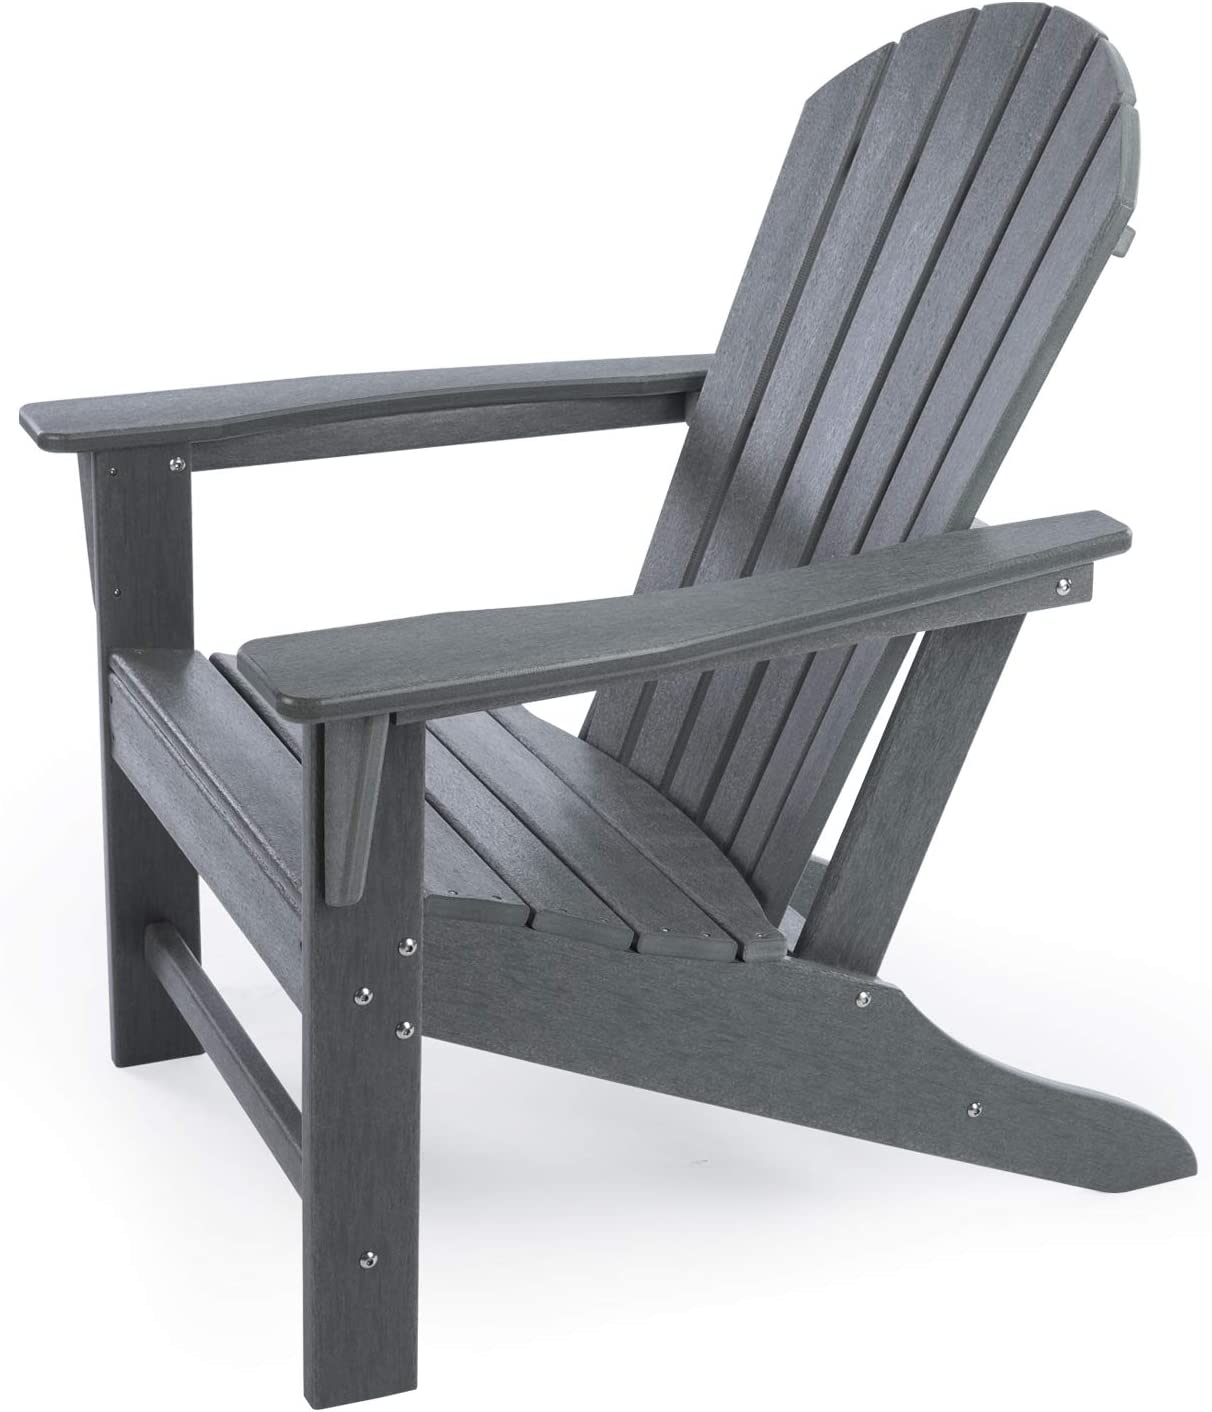 Amazon Com Dailylife Hdpe Plastic Resin Classic Outdoor Adirondack Chair For Patio Deck Garden Backyard Lawn Furniture Slate Gray Slate Gray Kitchen Dining